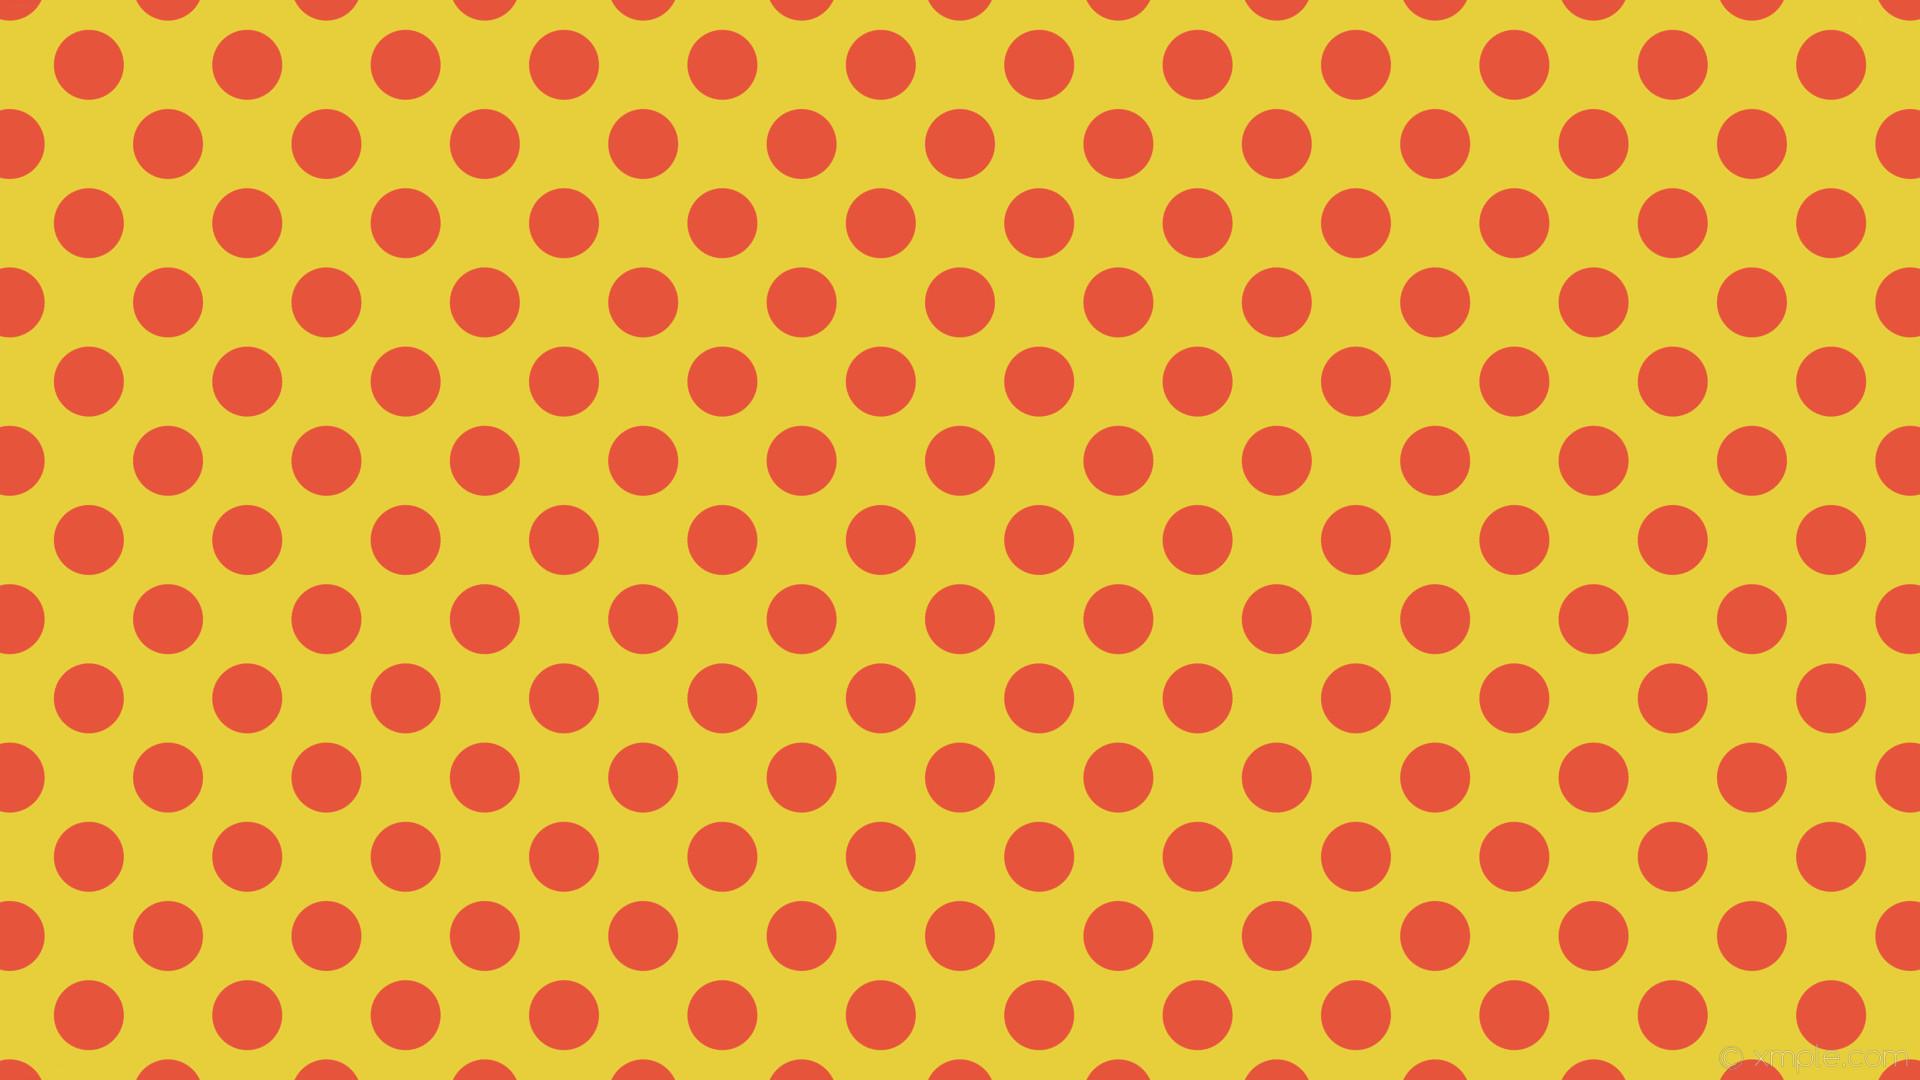 wallpaper yellow red polka spots dots #e7cf3c #e7543c 45° 70px 112px